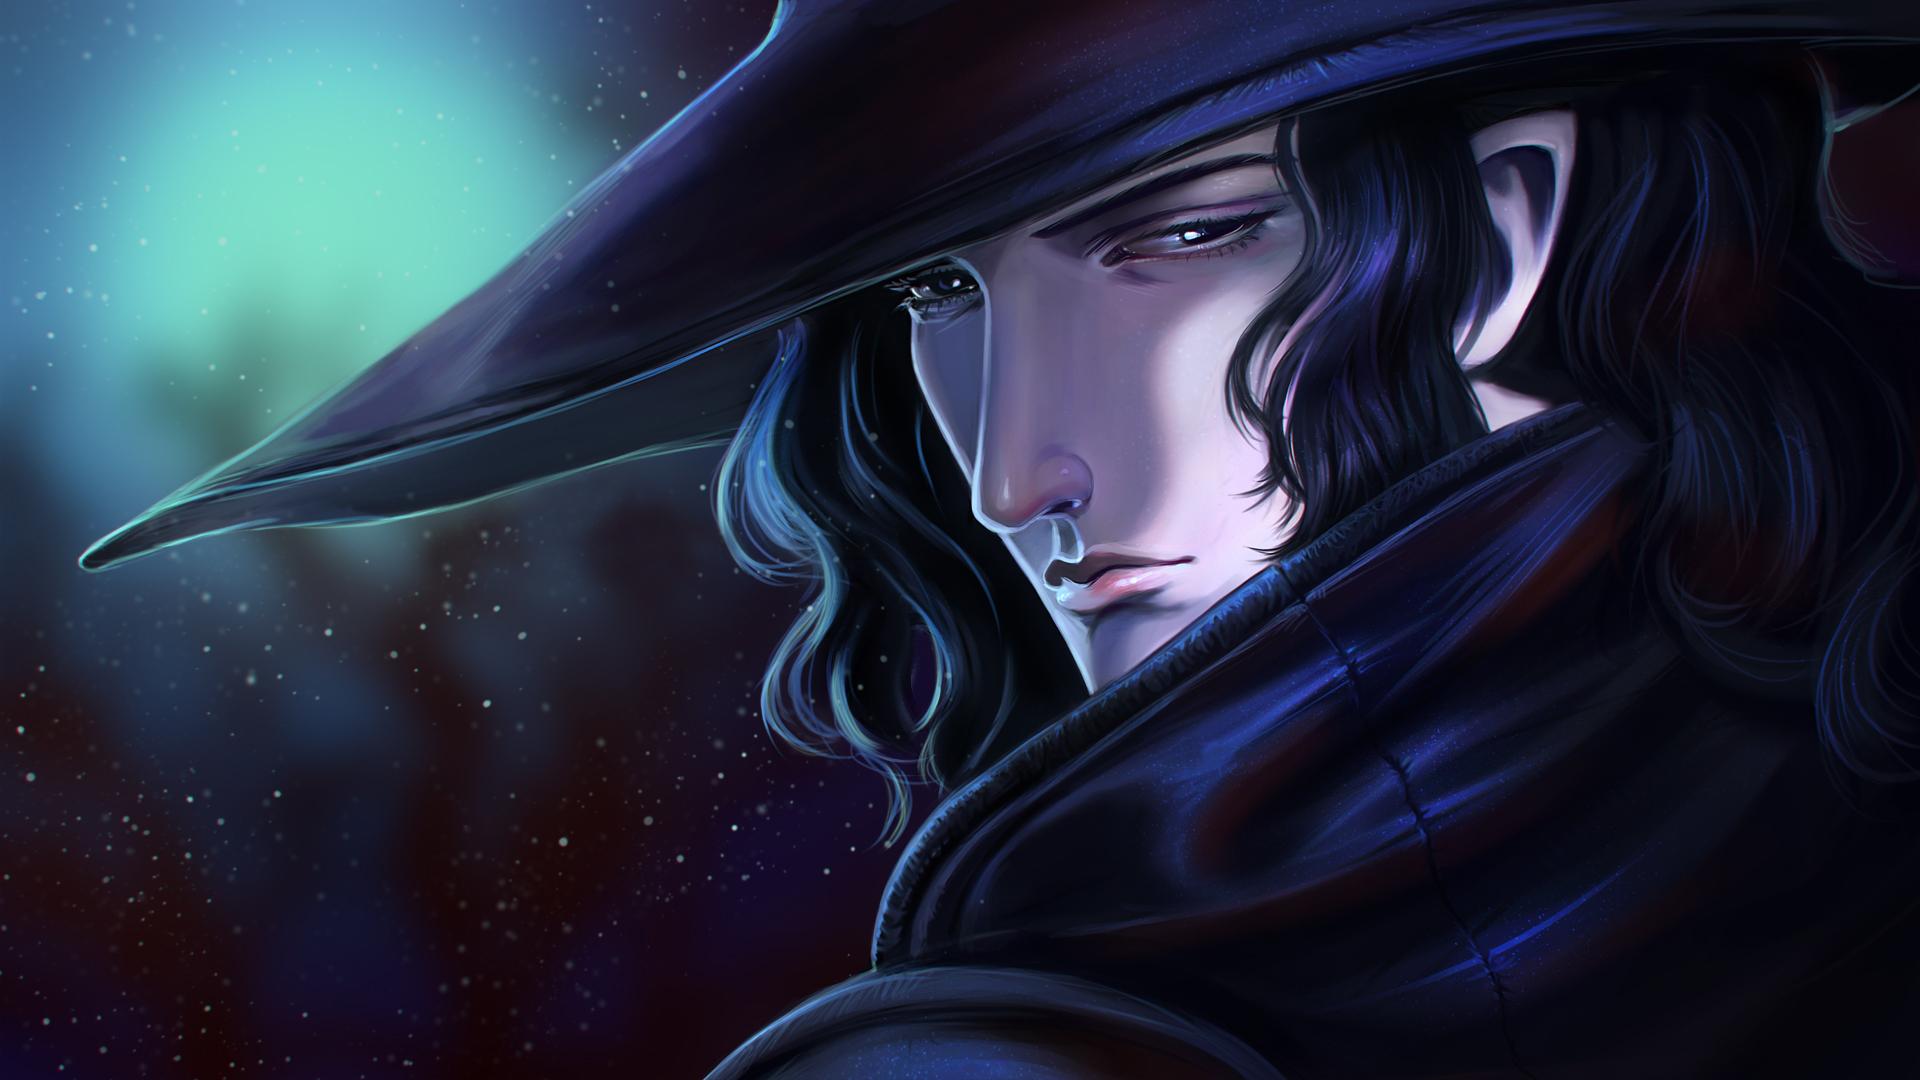 Download 800+ Wallpaper Anime Blood Hd HD Paling Baru